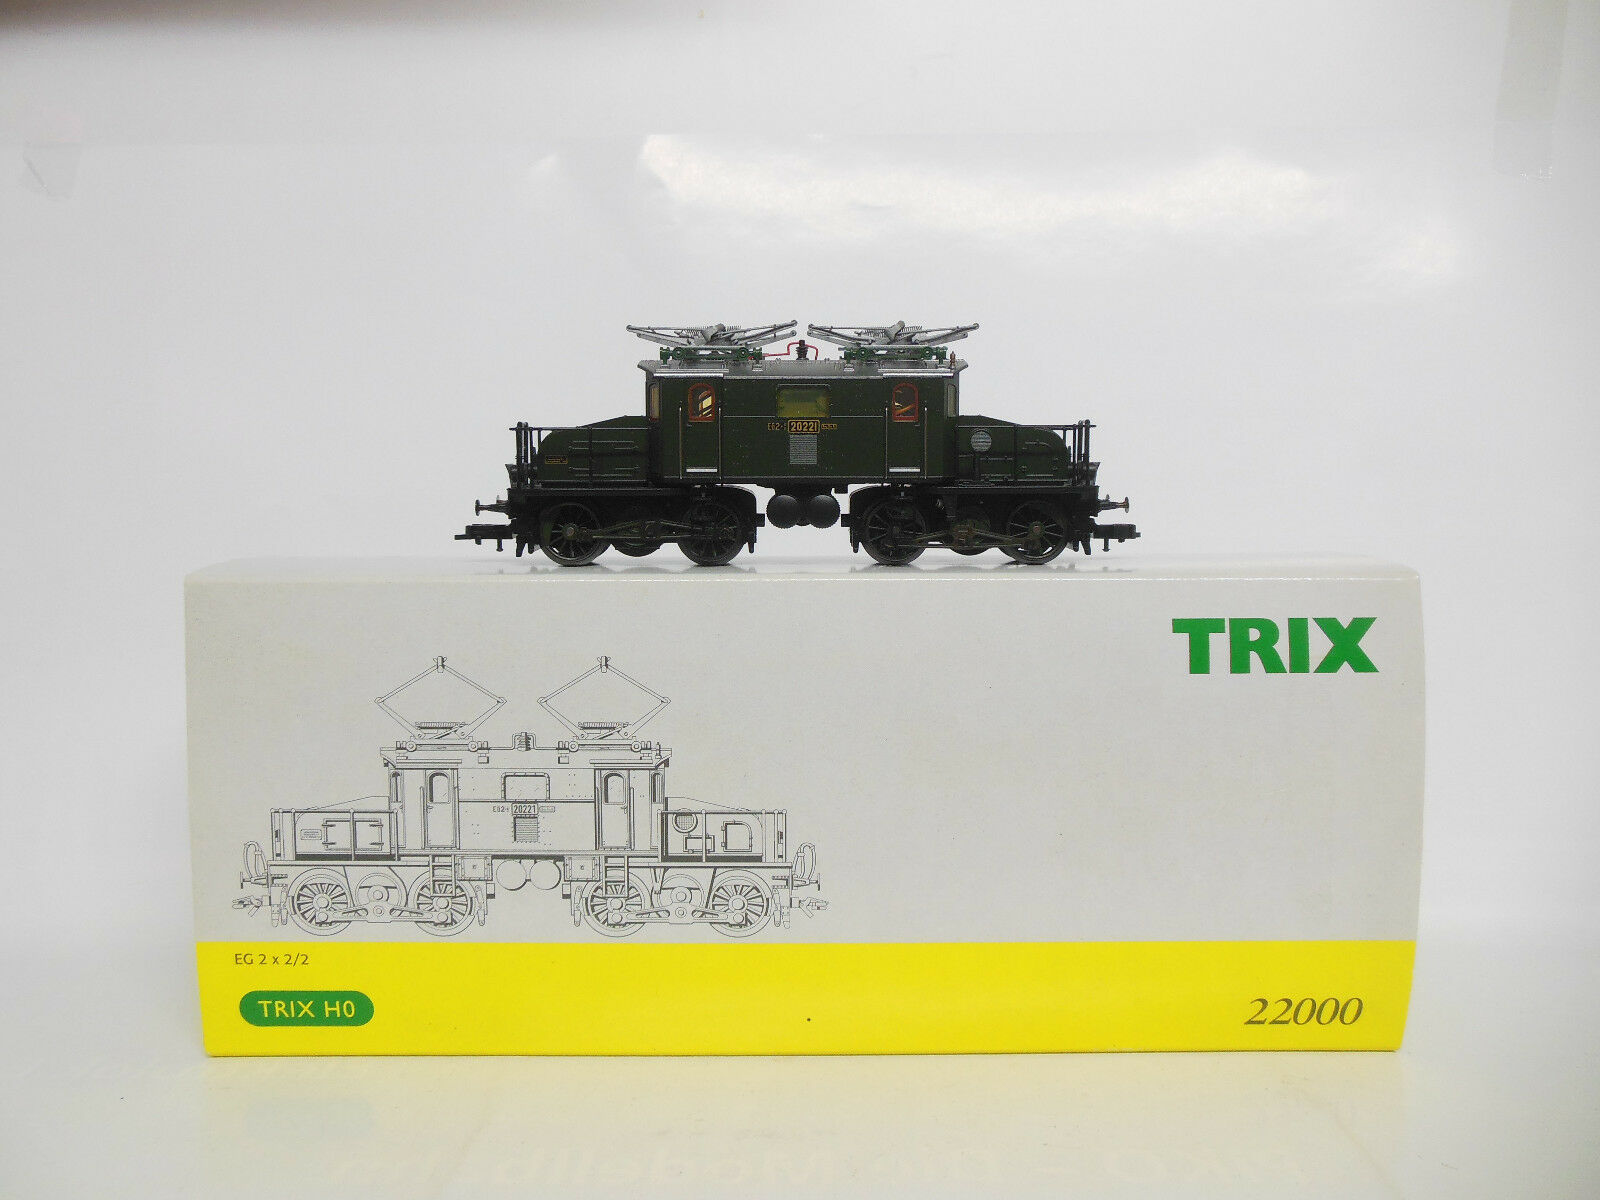 Trix 22000 - BR EG 2x2 2 K.Bay.Sts.B. - - - ESU Lokpilot V2.0 - OVP - SONDERPREIS  | Auktion  72ca61